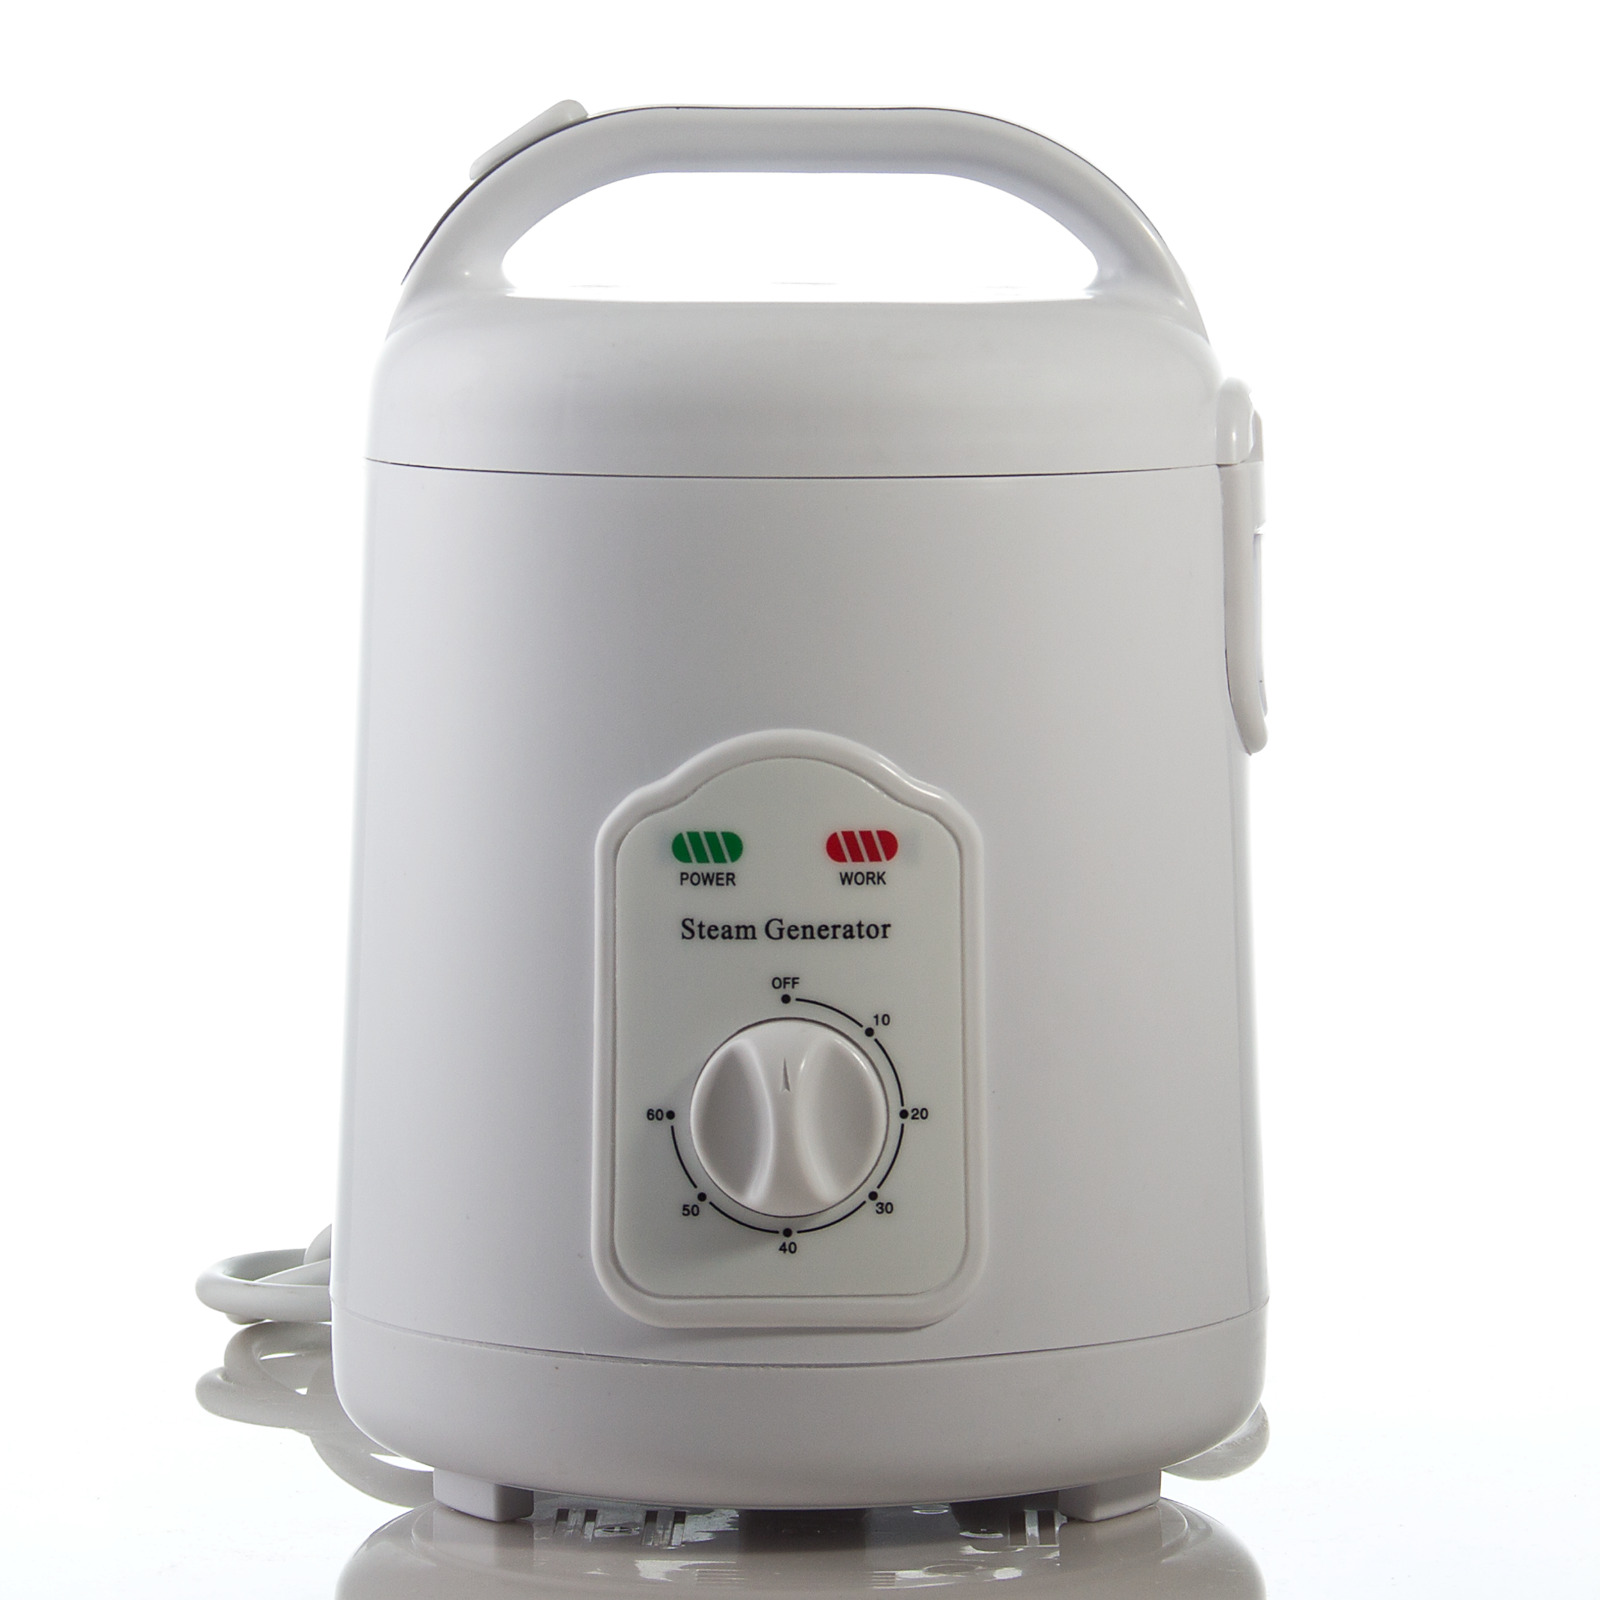 Portable Steamer Machine Unit Designed for Saunas or Steam